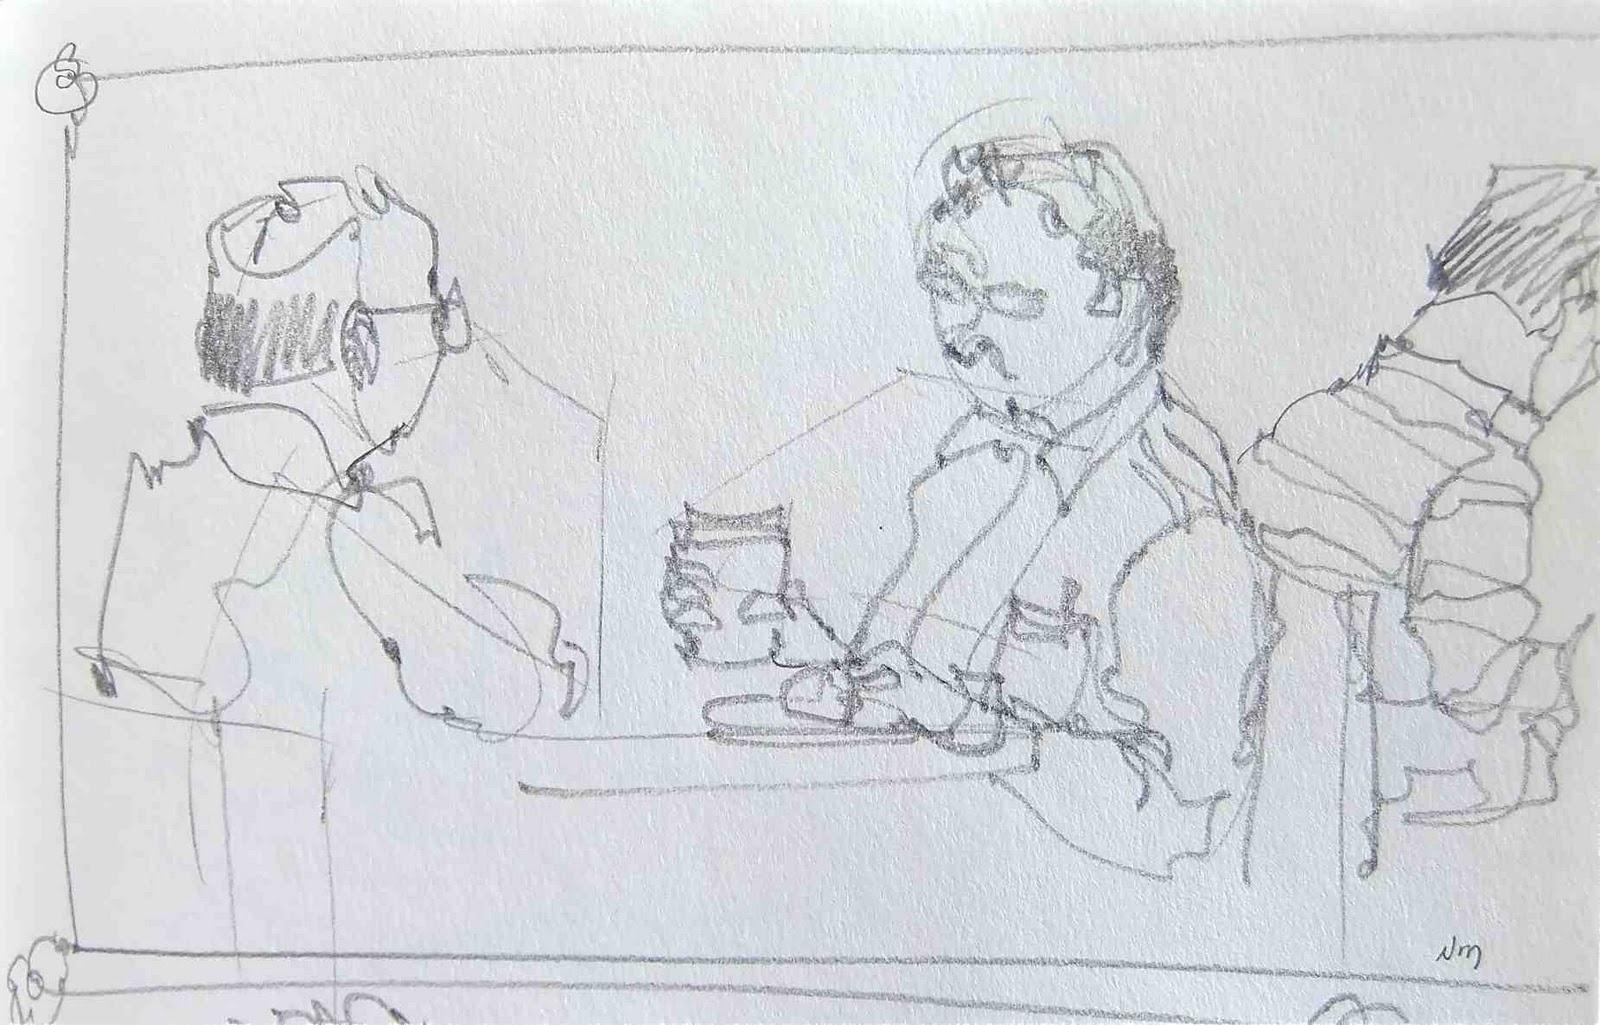 Line Drawing Pencil : Nora macphail artist november